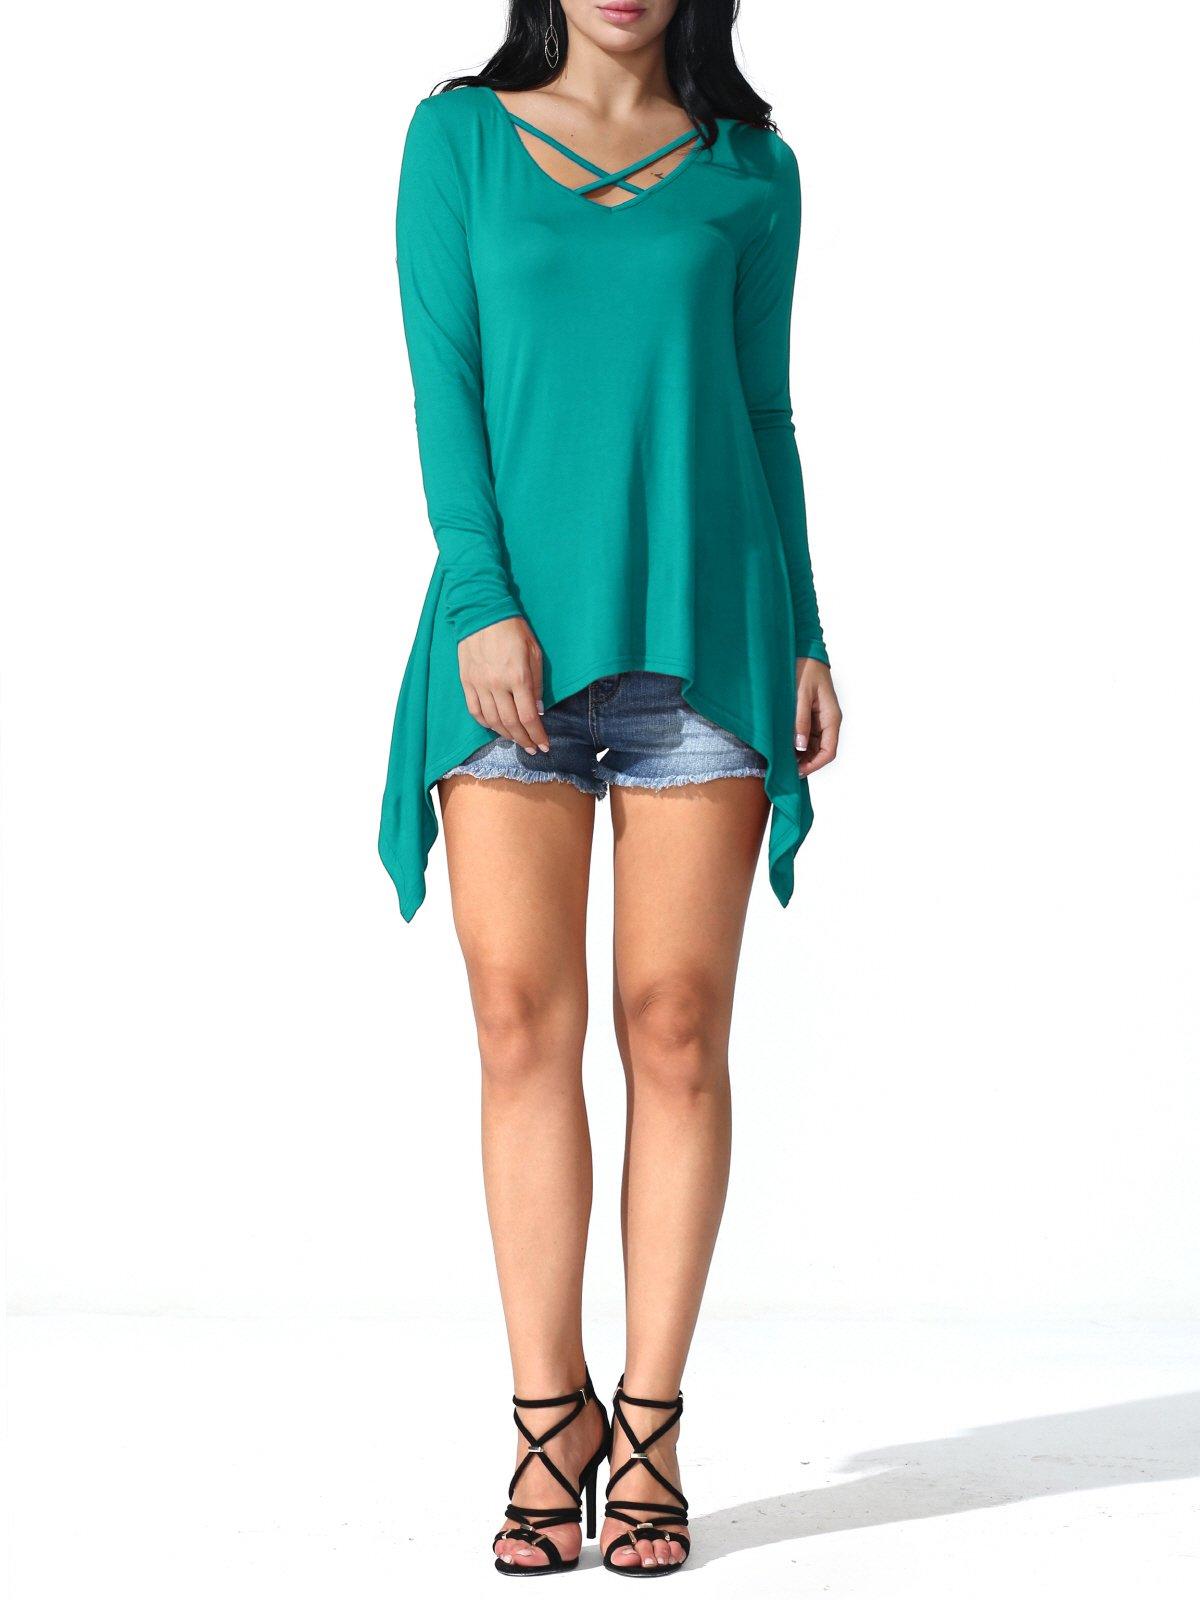 Prime Deal JayJay Women Prime Plus Size V Criss Cross Neck Long Sleeve Summer Tunic Tops,Jade,M